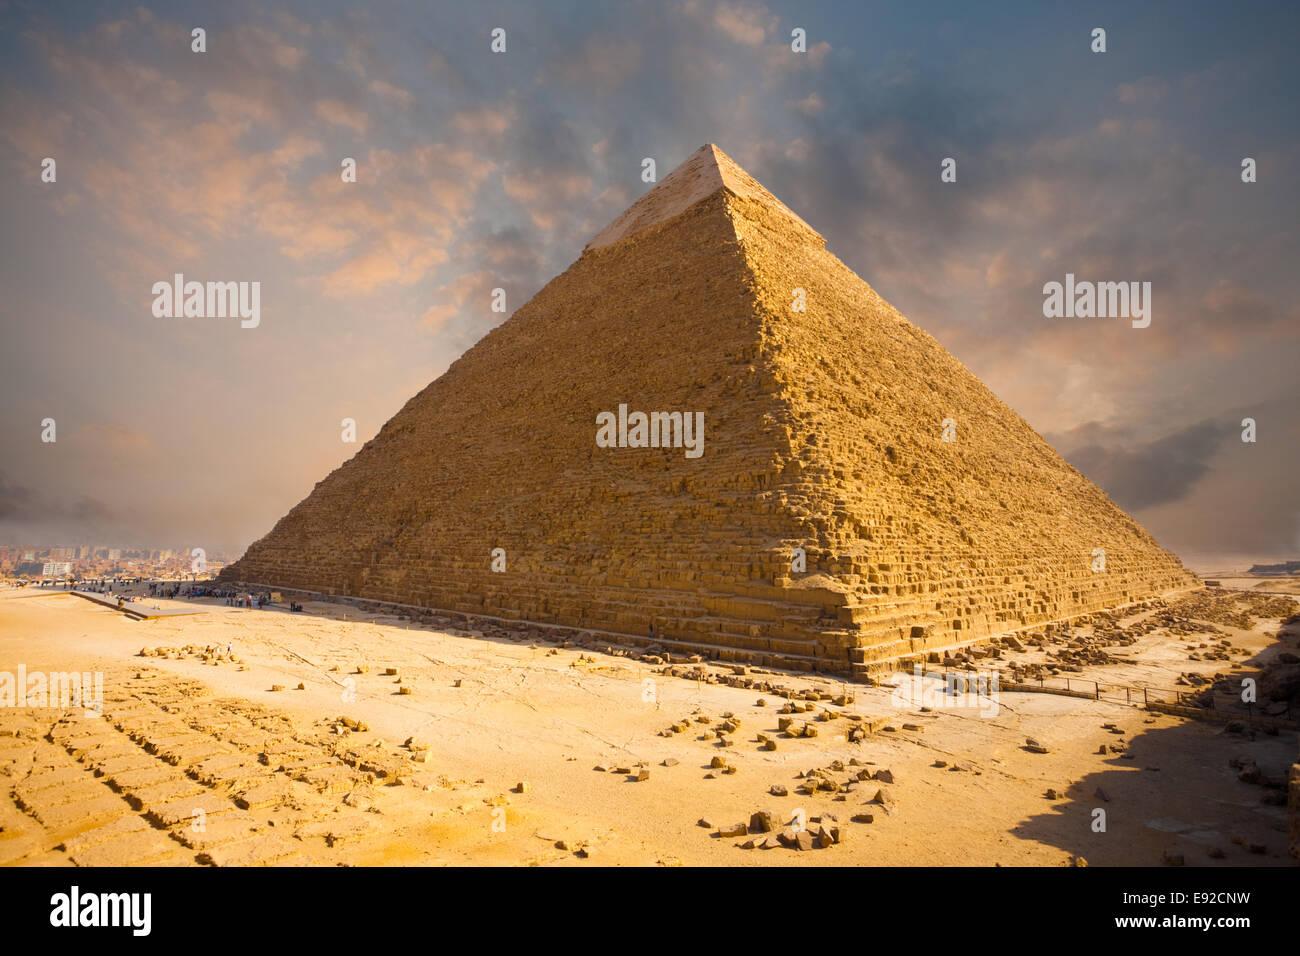 Fiery Sky pyramide de Gizeh Egypte Photo Stock